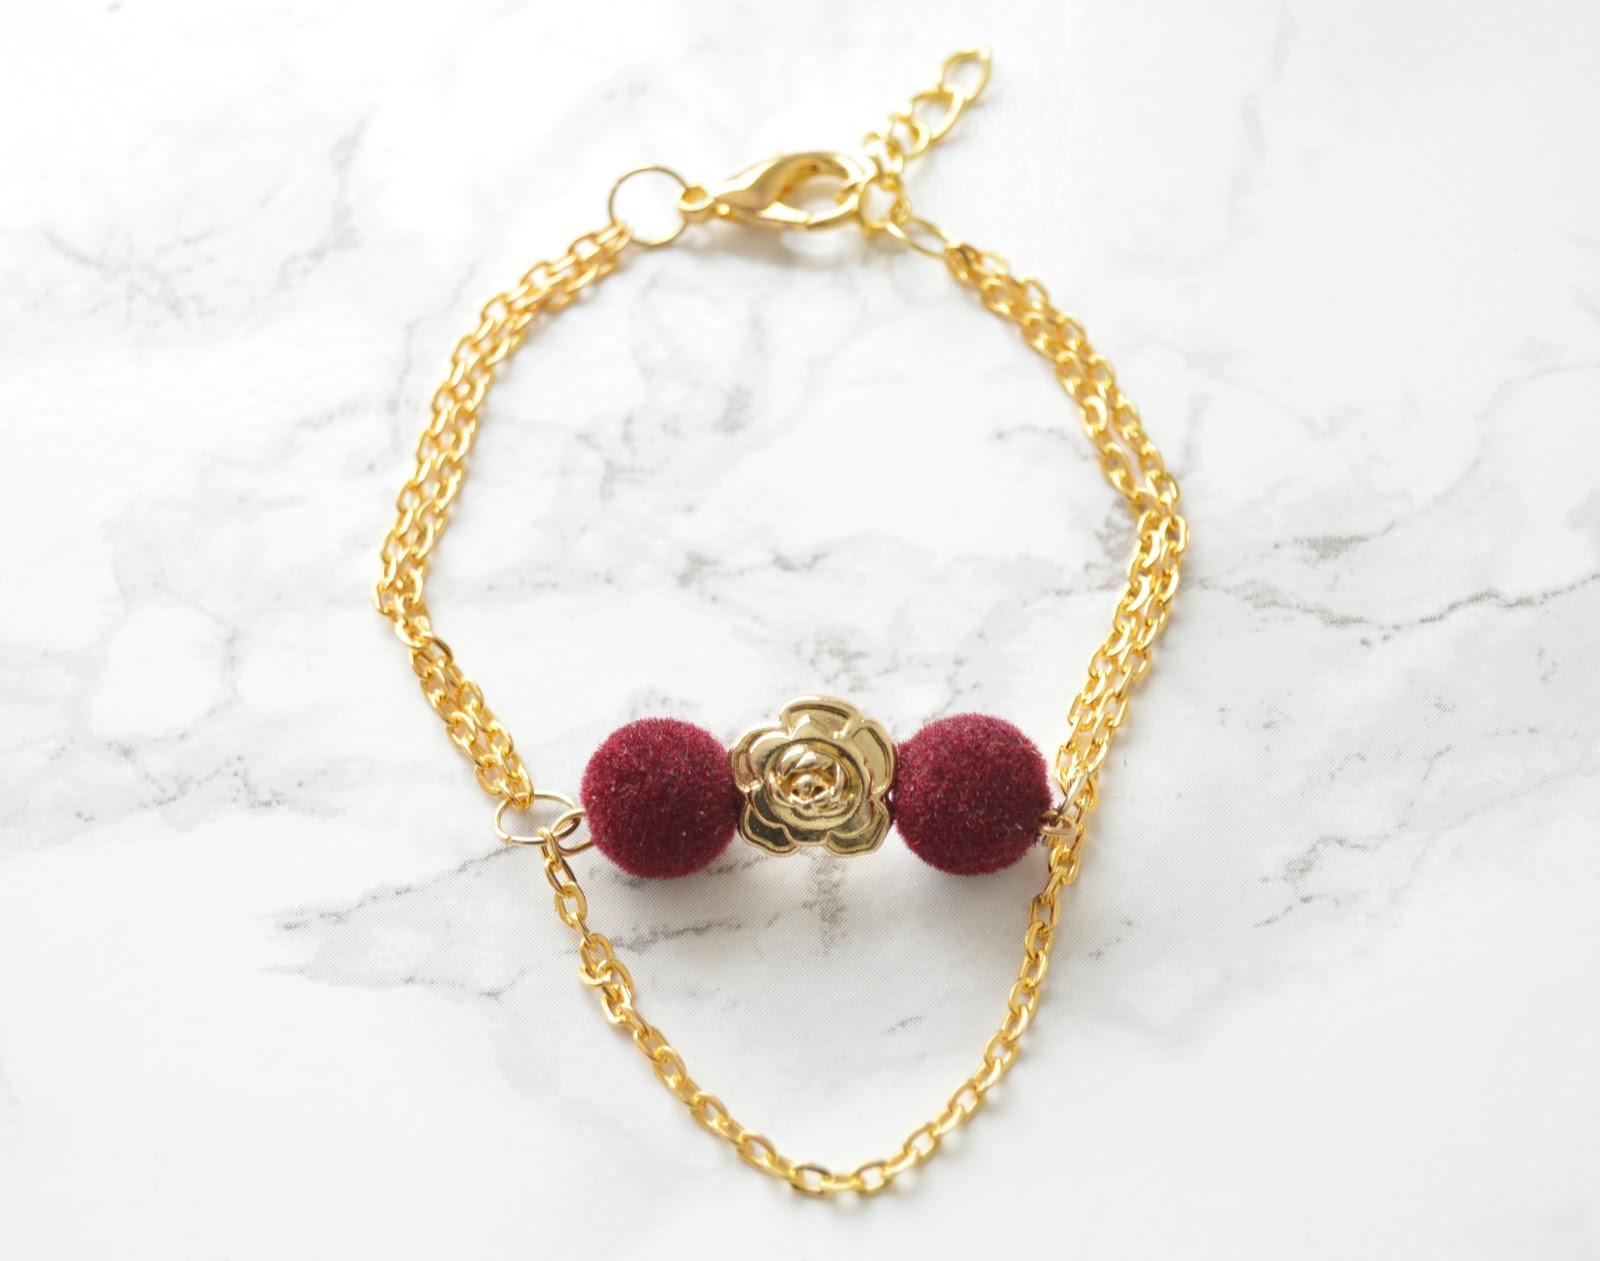 Vikalpah: DIY Simple bracelets - 2 Styles